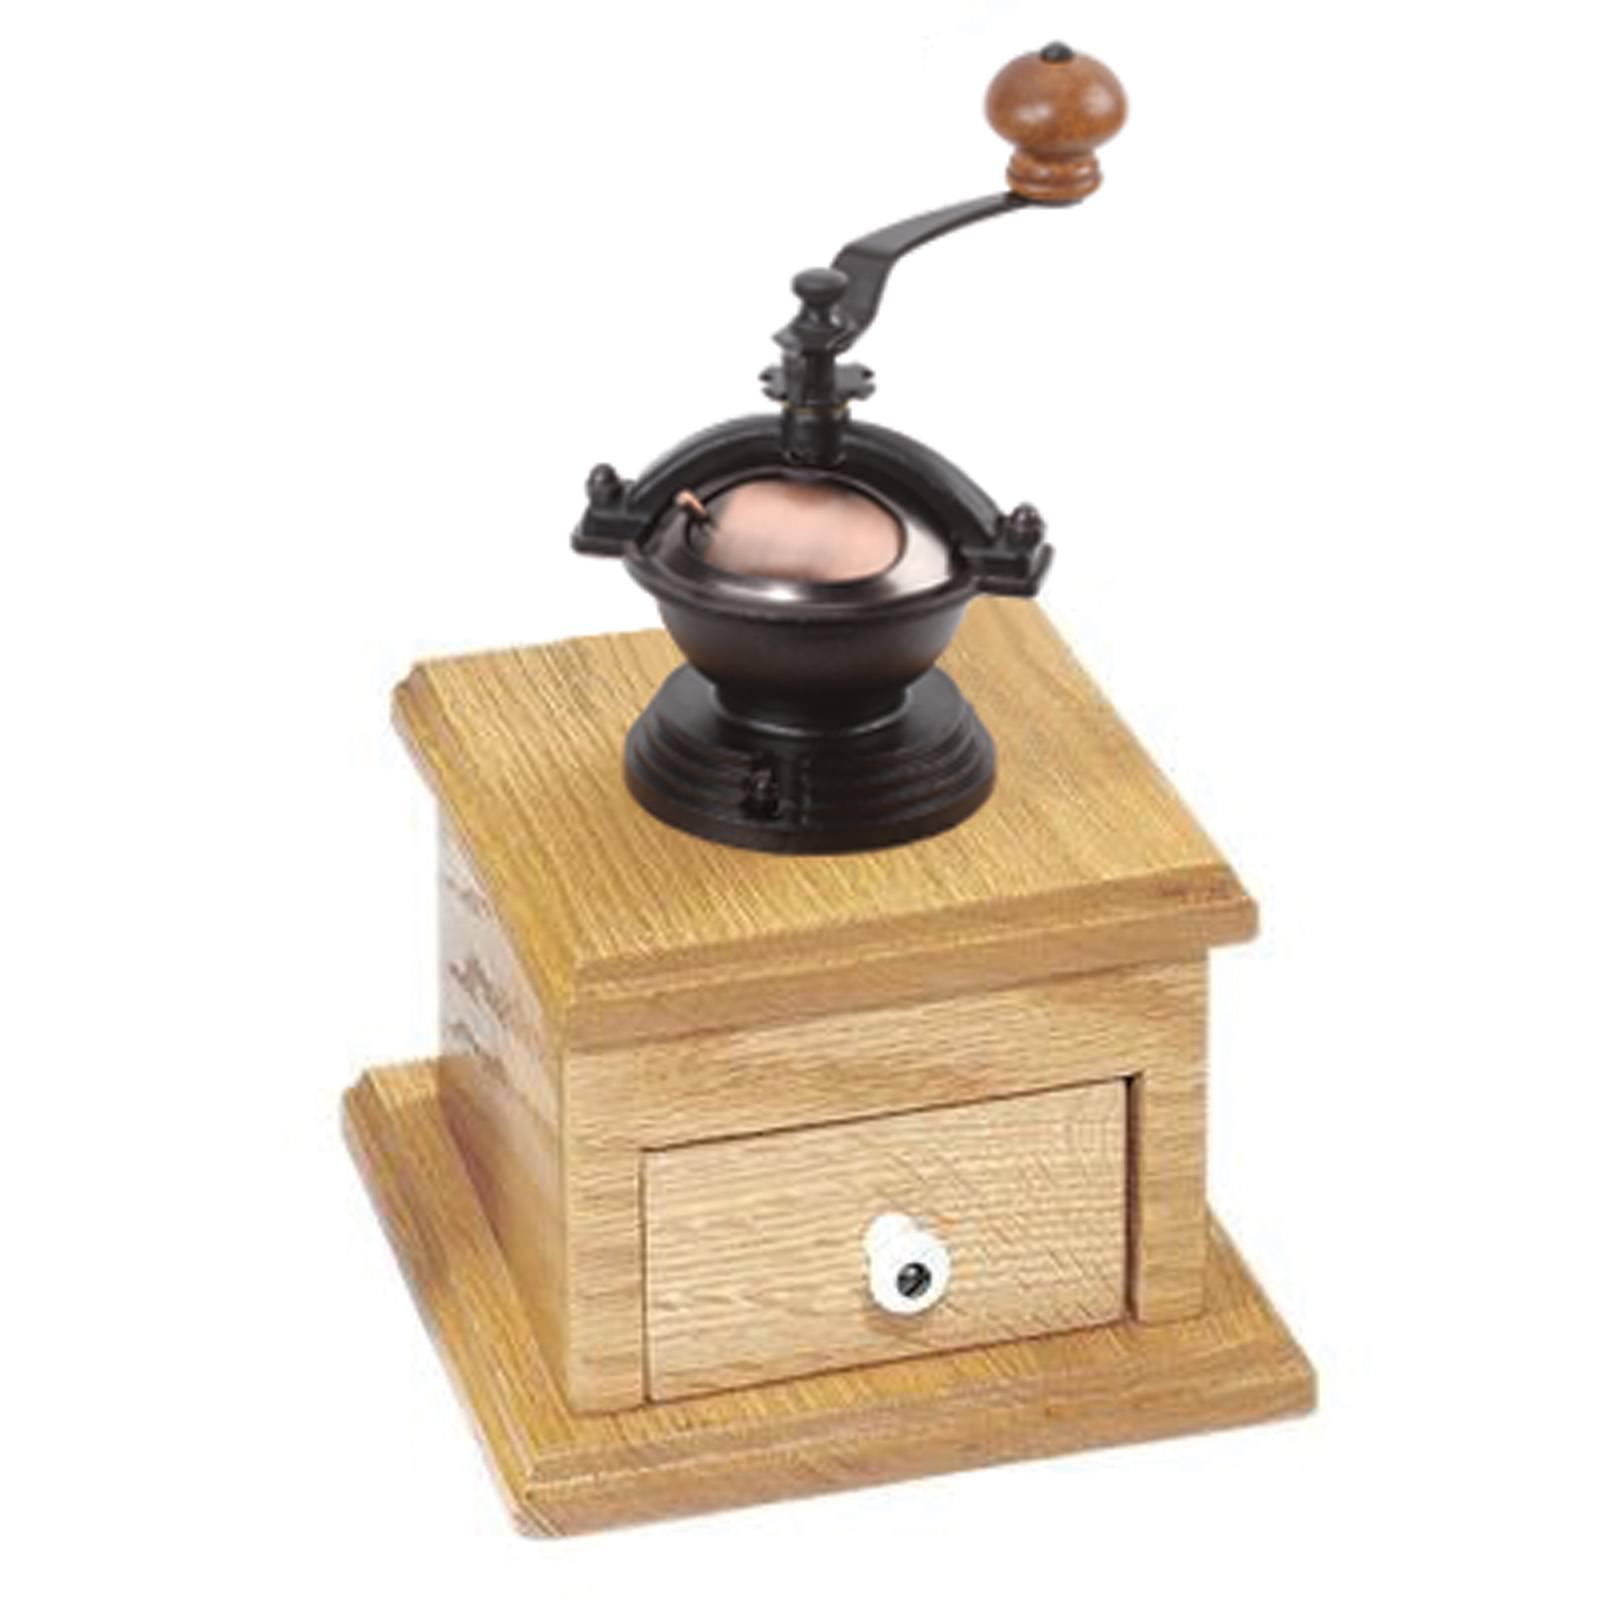 Antique Copper Housing Coffee Grinder Mechanism: 3 in. x 3 in. x 5 ...